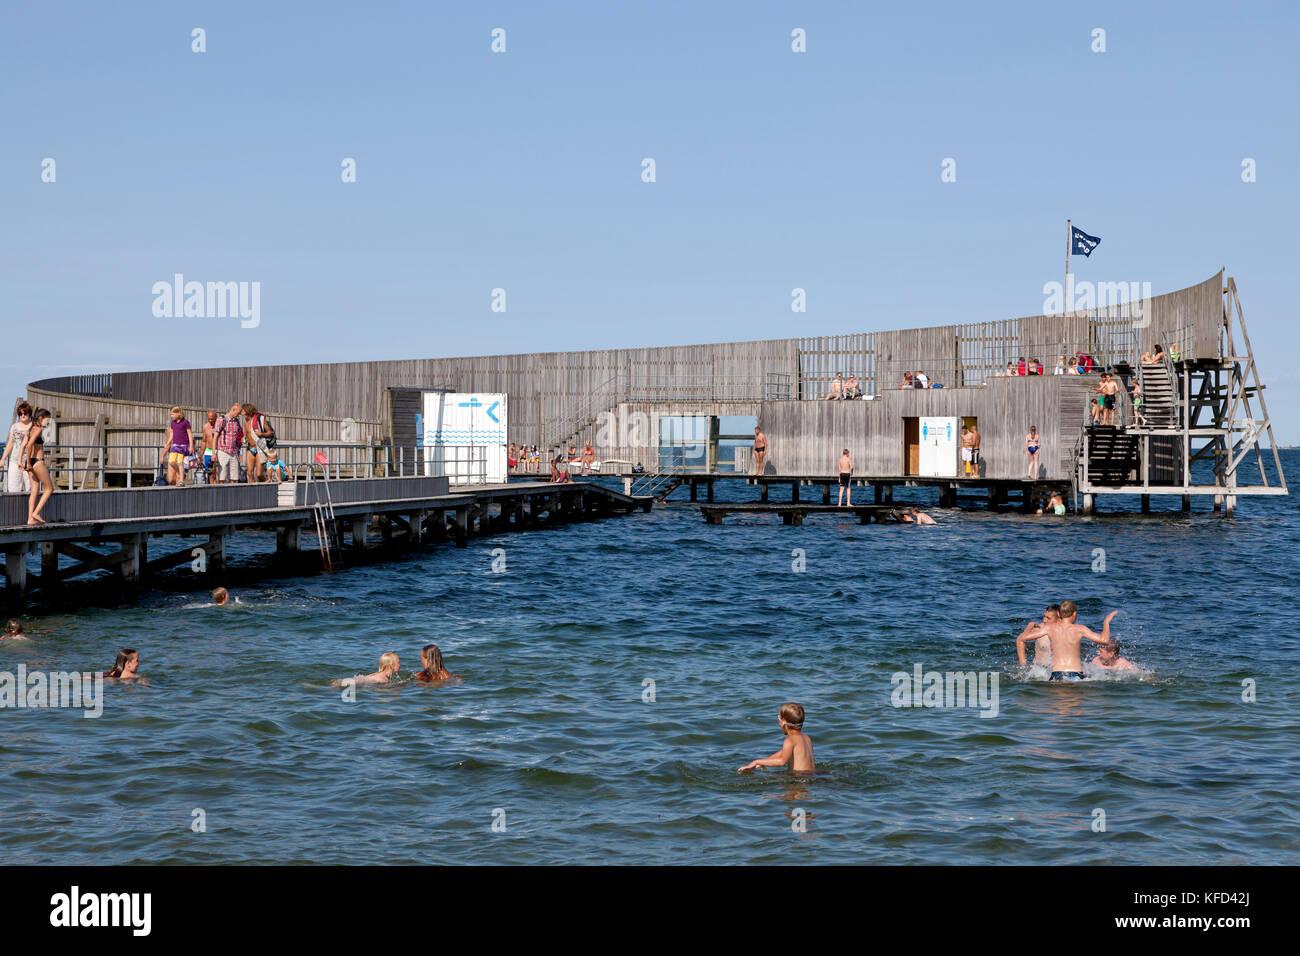 Kastrup Søbad, Sneglen, Kastrup Public Baths, the Snail, on Amager, Copenhagen.  Architect designed bathing platform Stock Photo